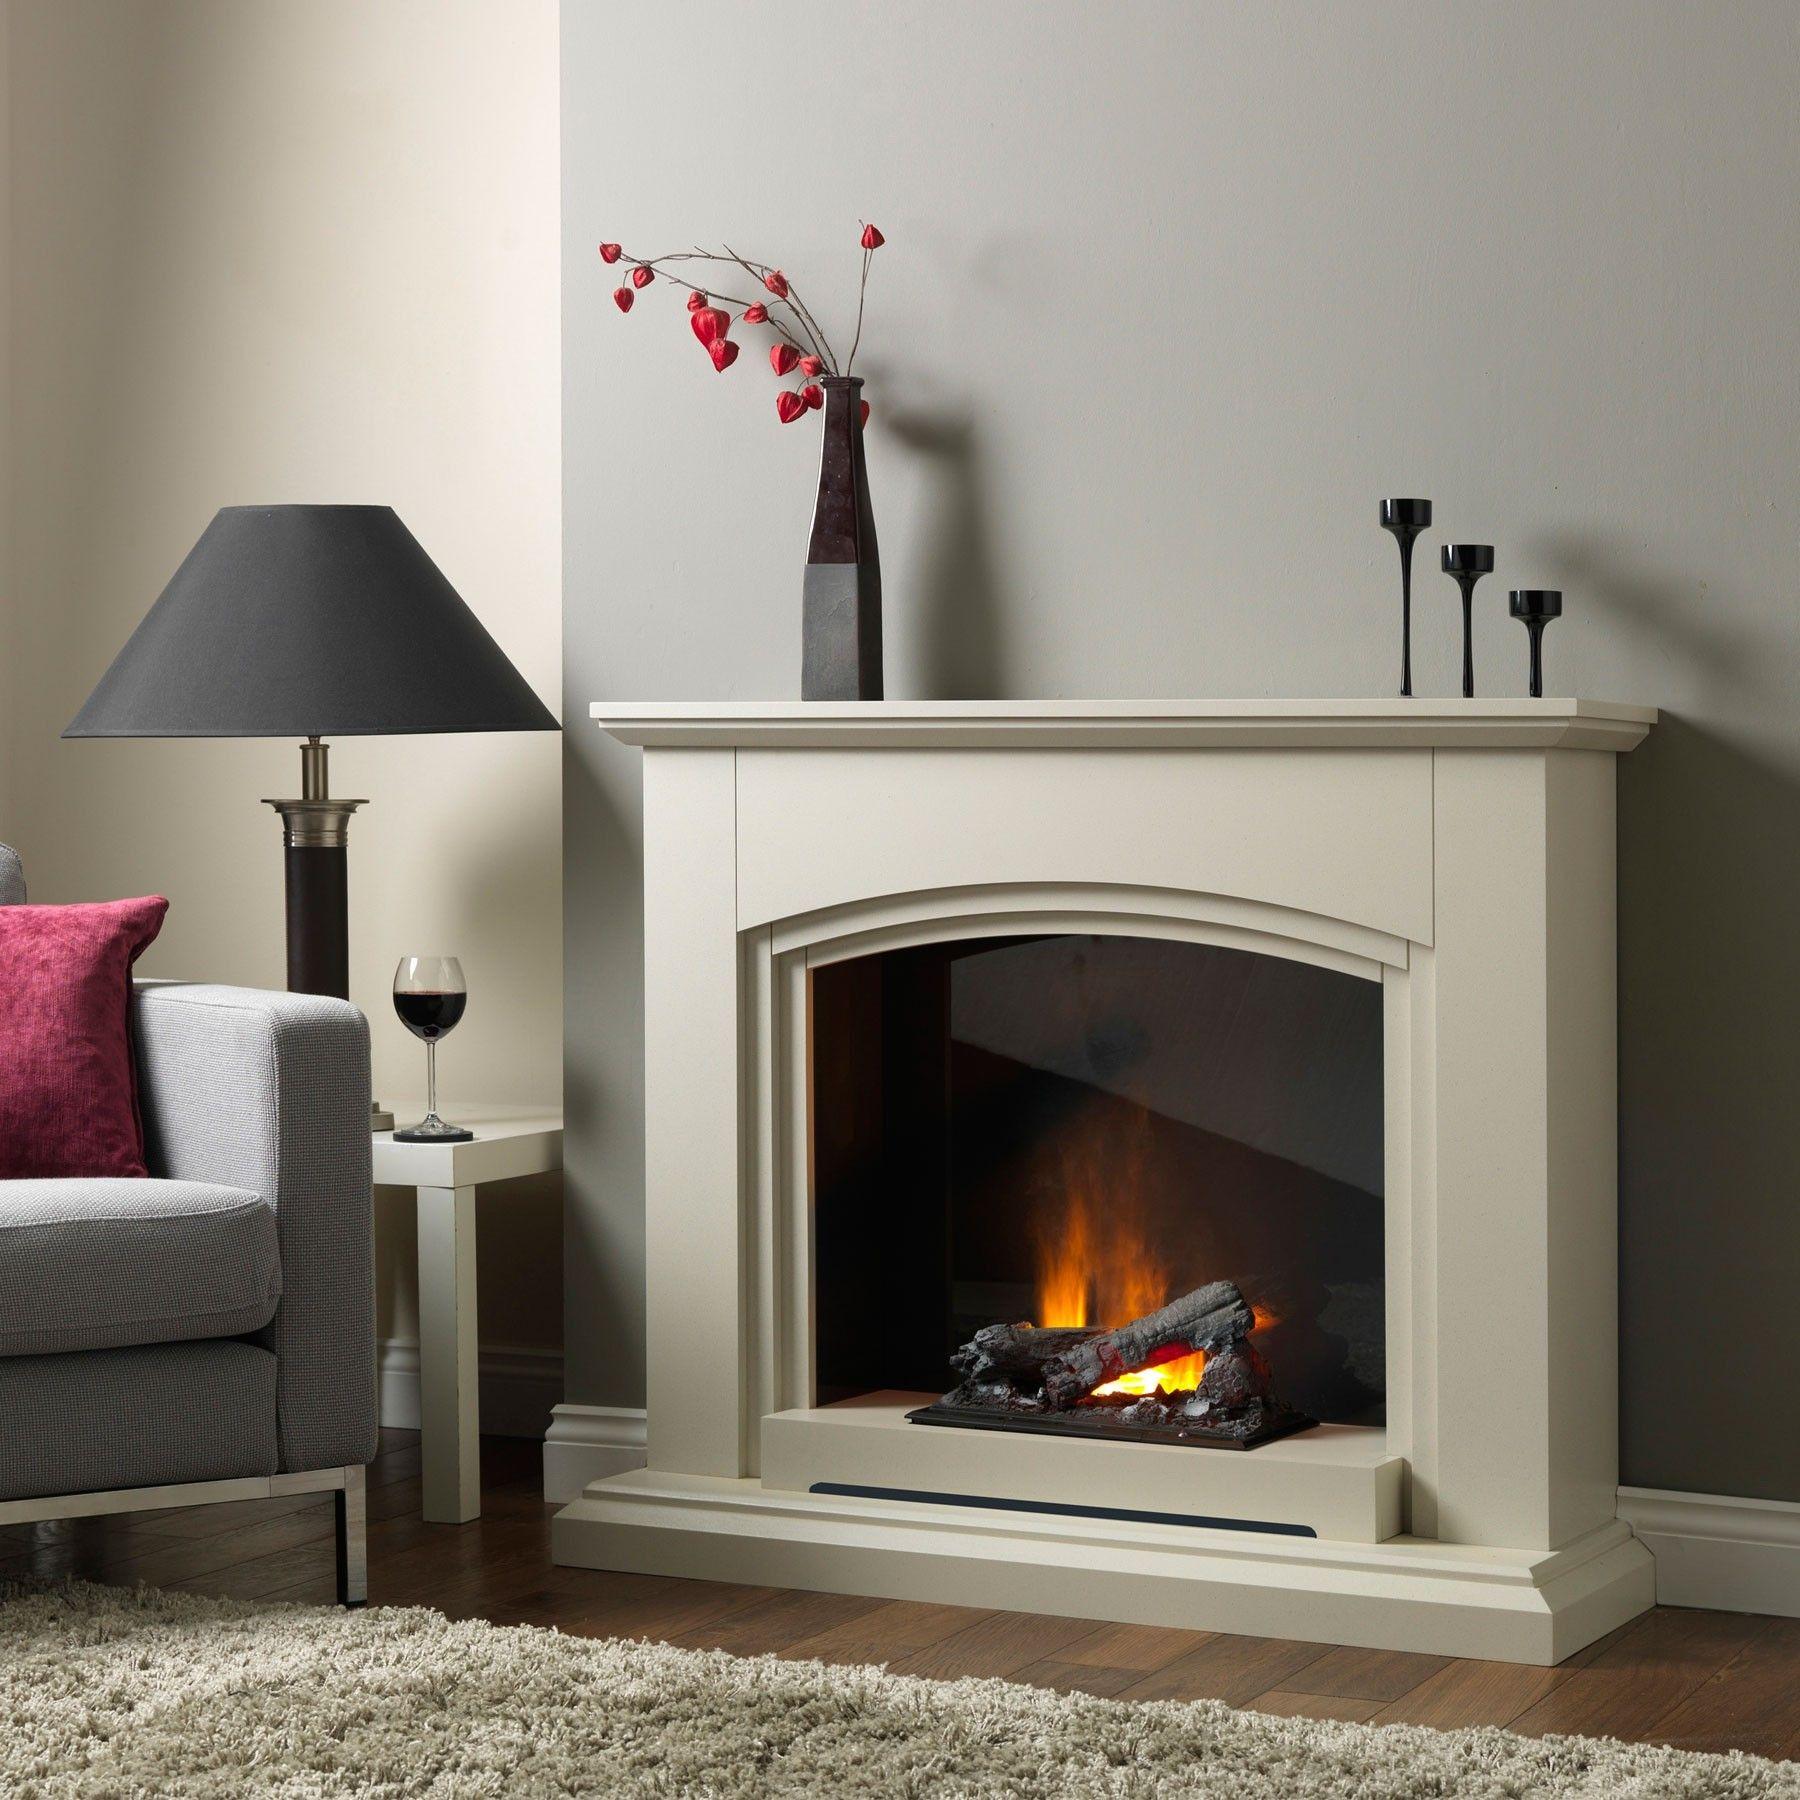 Siena sandstone electric fireplace suite mum pinterest